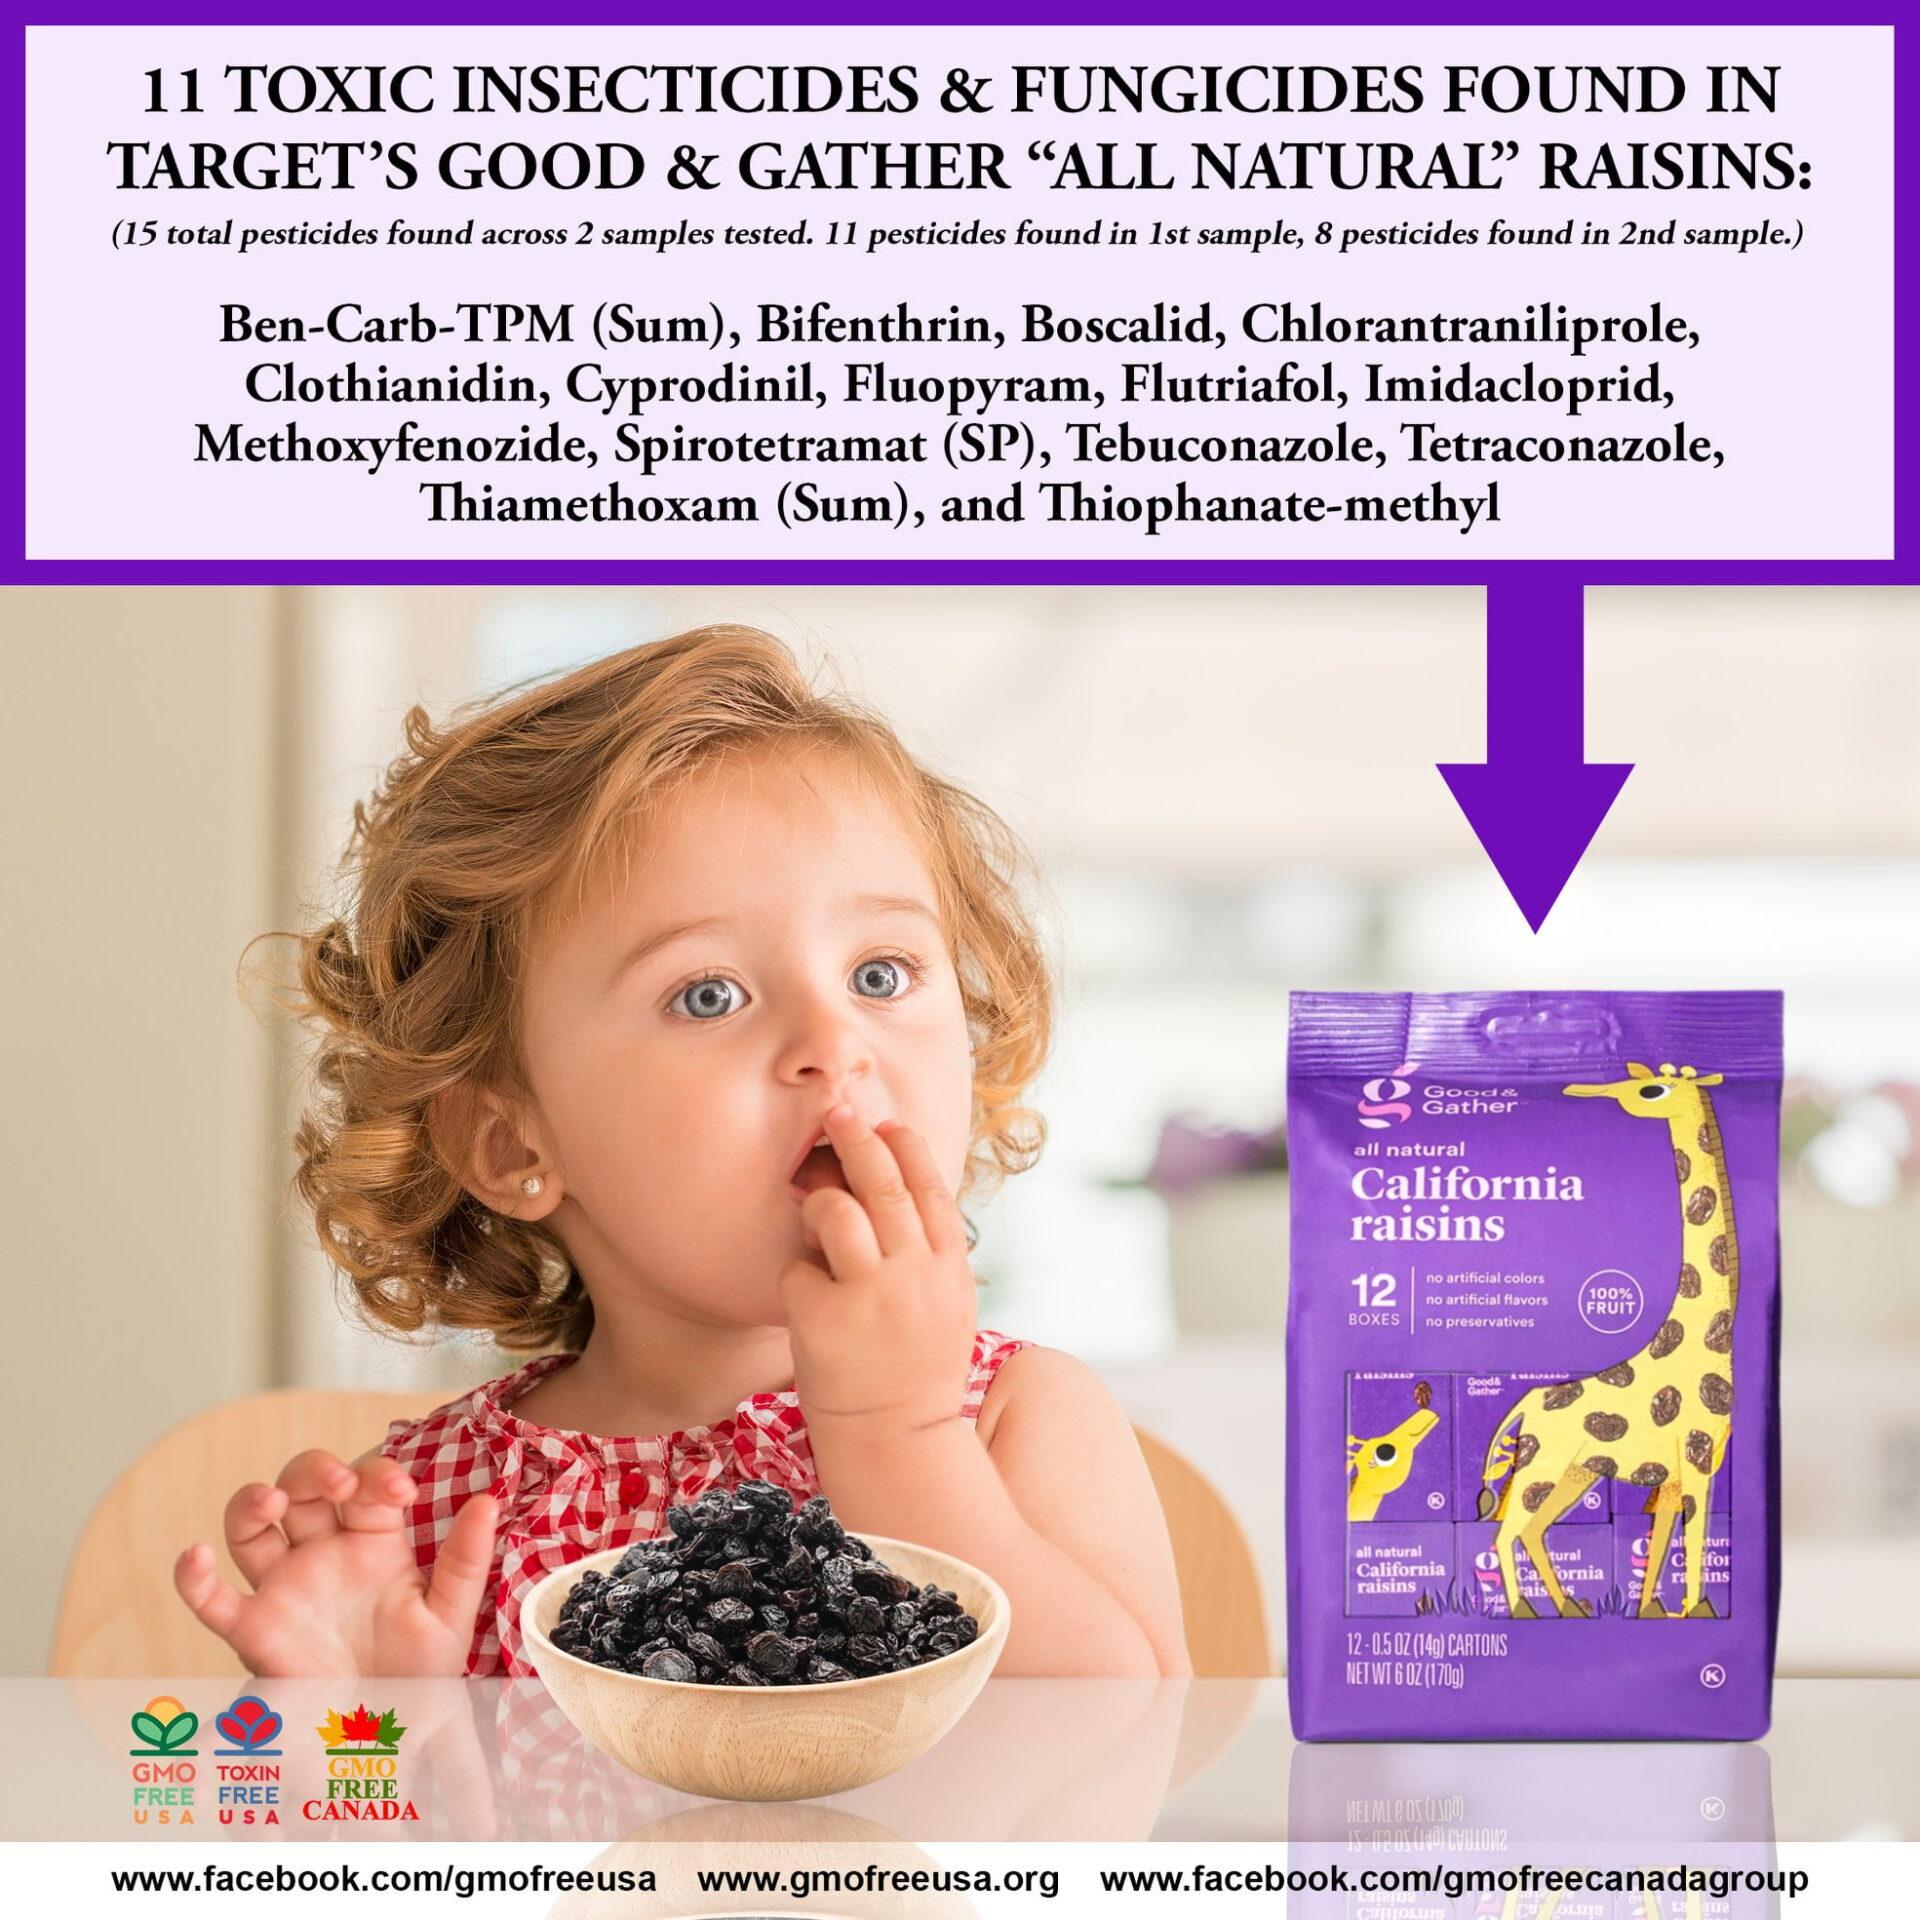 Image meme with young girl eating target raisins